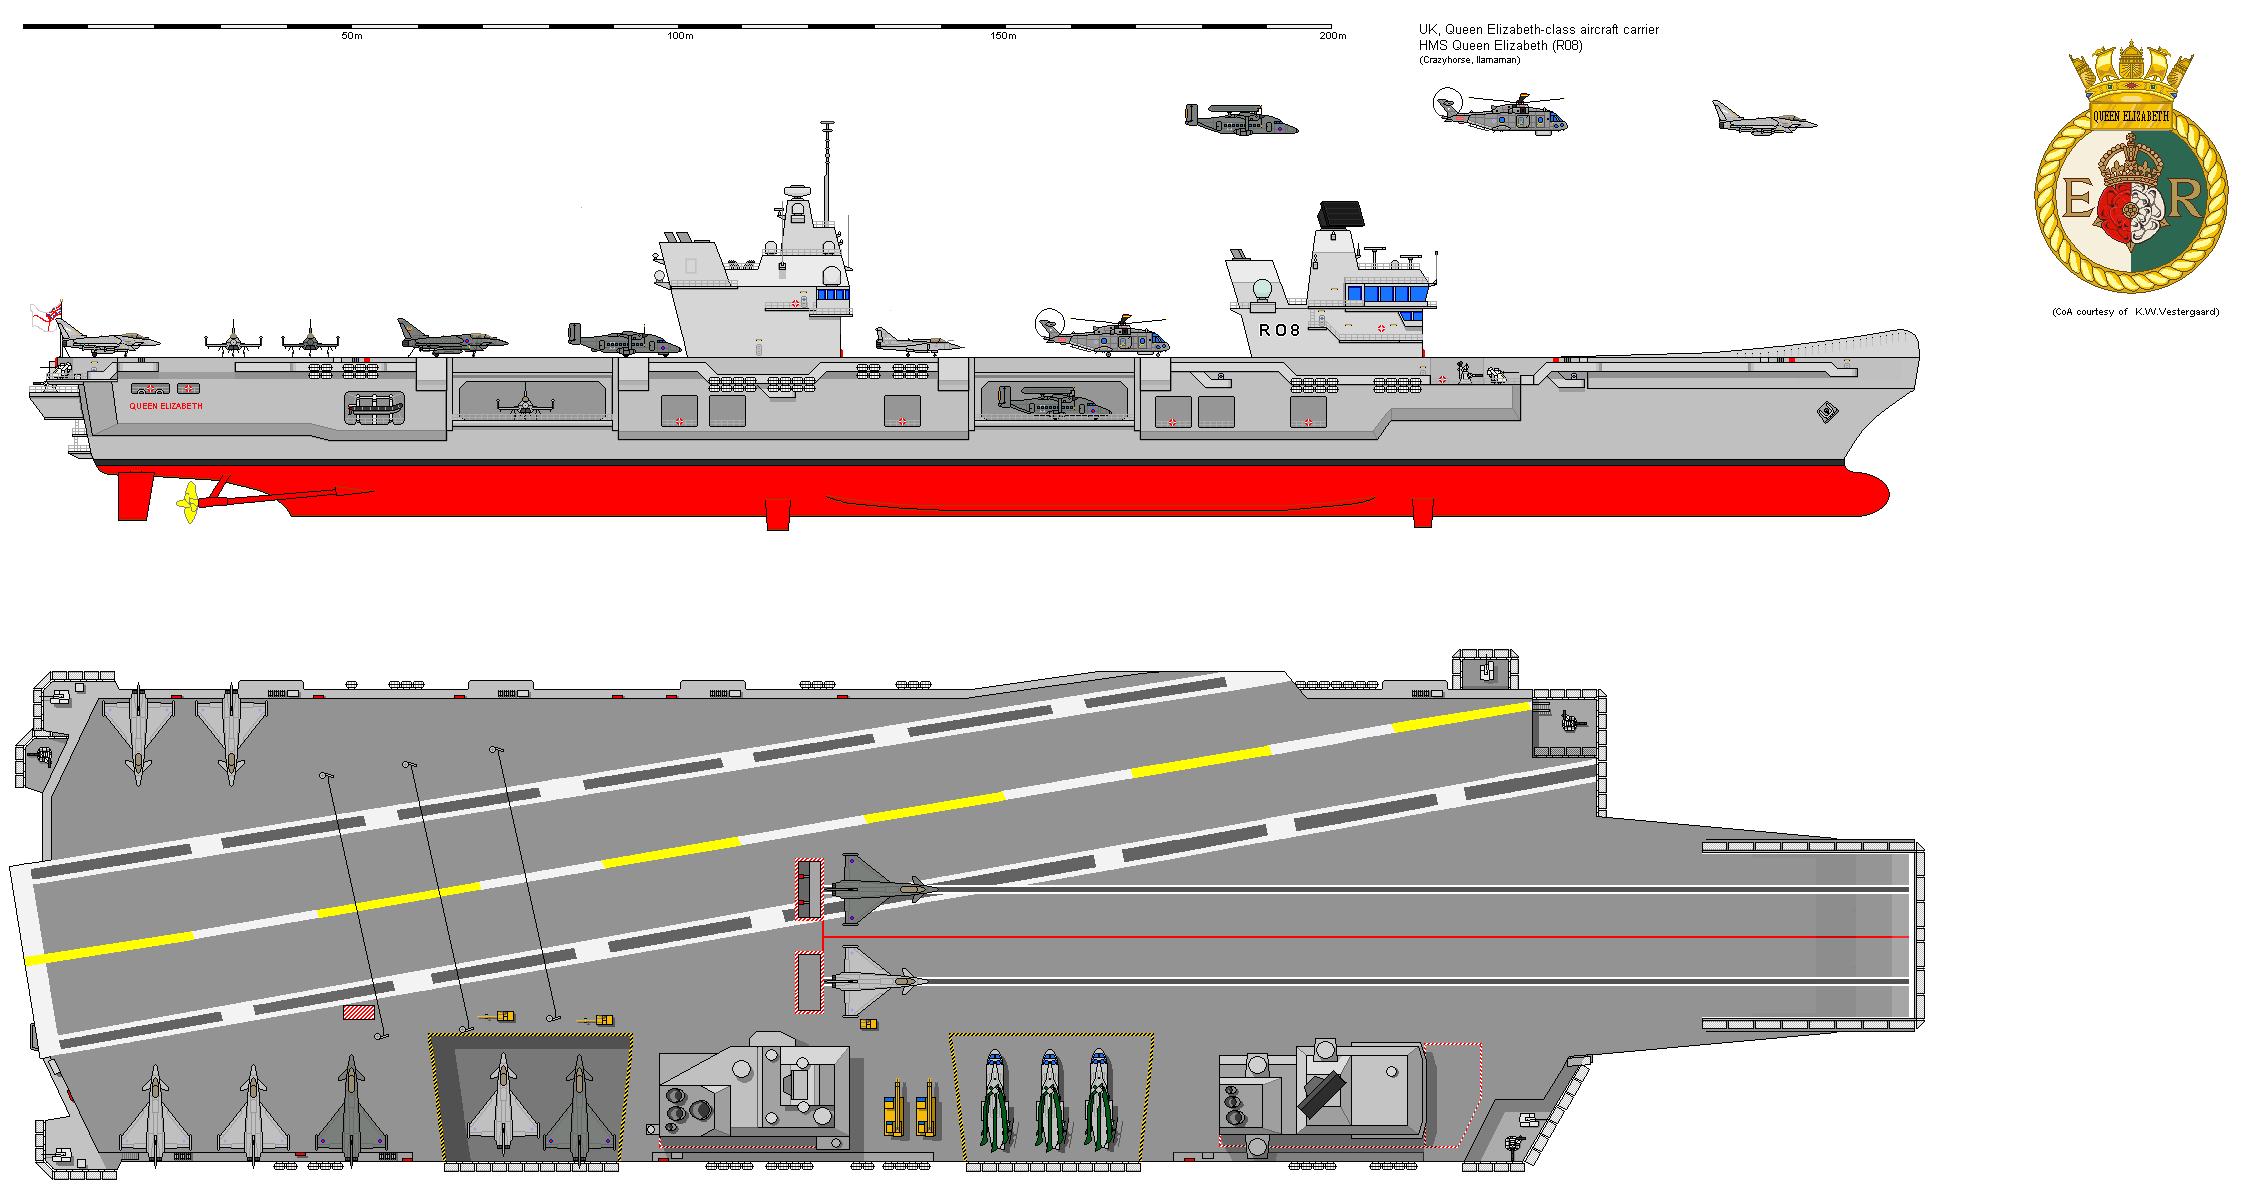 Hms Queen Elizabeth R08 Saxonverse By Dave Llamaman Dbg9nps Png 2250 1200 Aircraft Carrier Navy Carriers Hms Queen Elizabeth